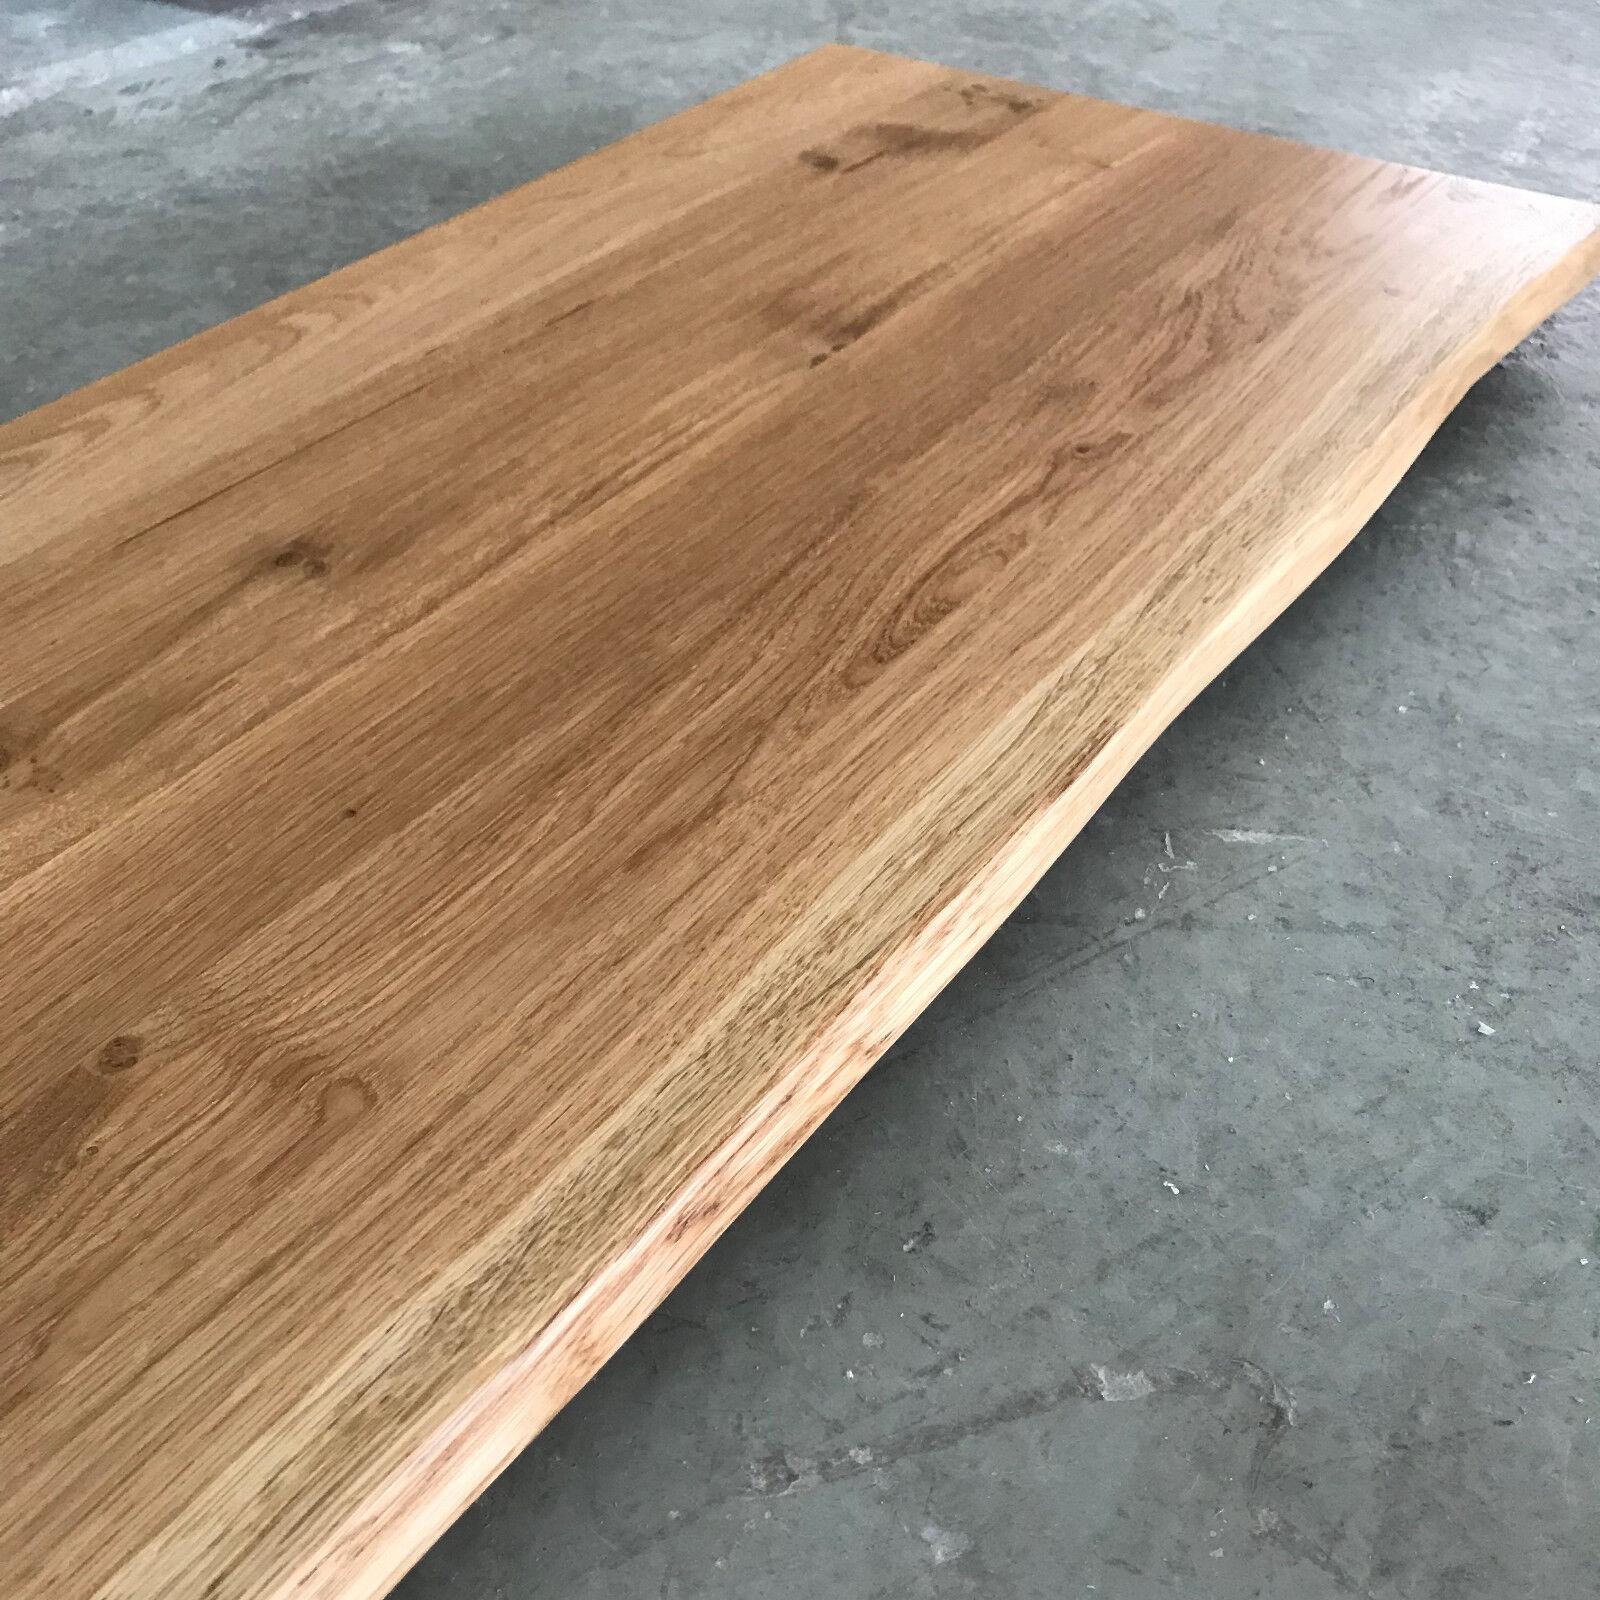 tischplatte platte eiche massiv holz neu tisch brett. Black Bedroom Furniture Sets. Home Design Ideas